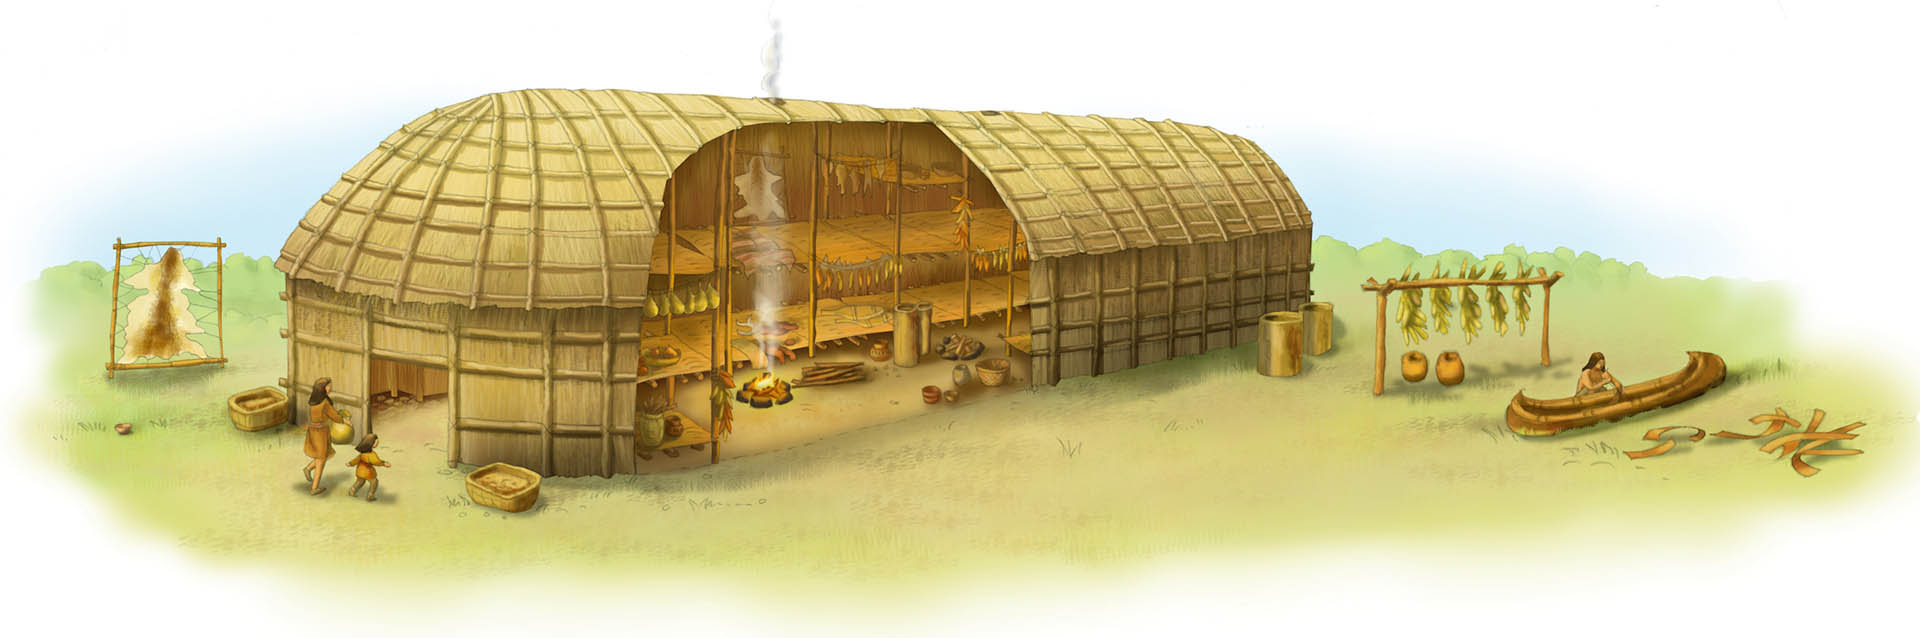 Longhouse Illustration • Pearson USA